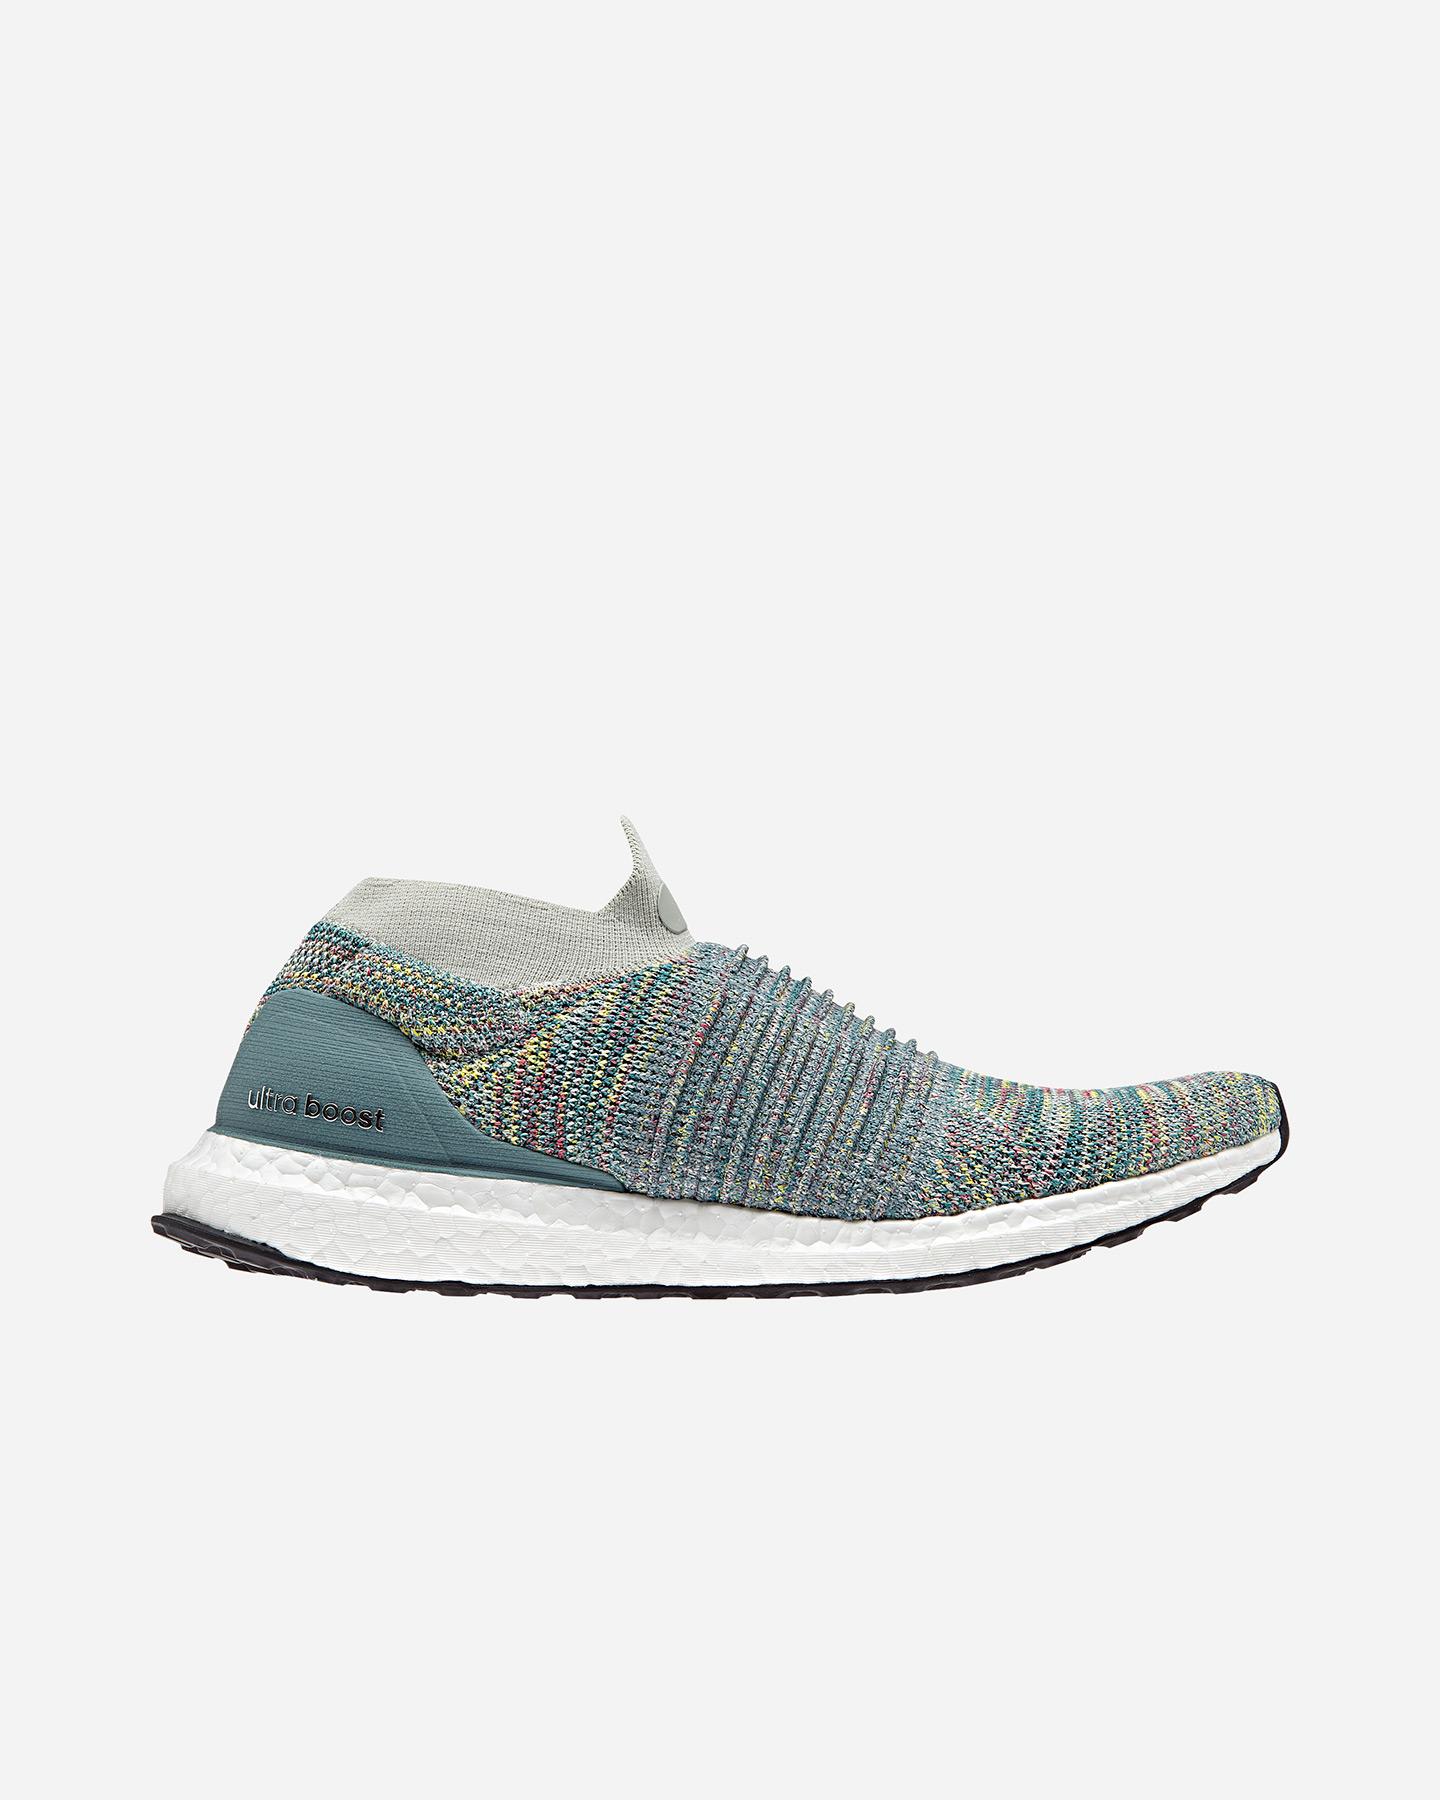 new arrival 4c954 2e2ce Scarpe sneakers ADIDAS ULTRABOOST LACELESS M ...